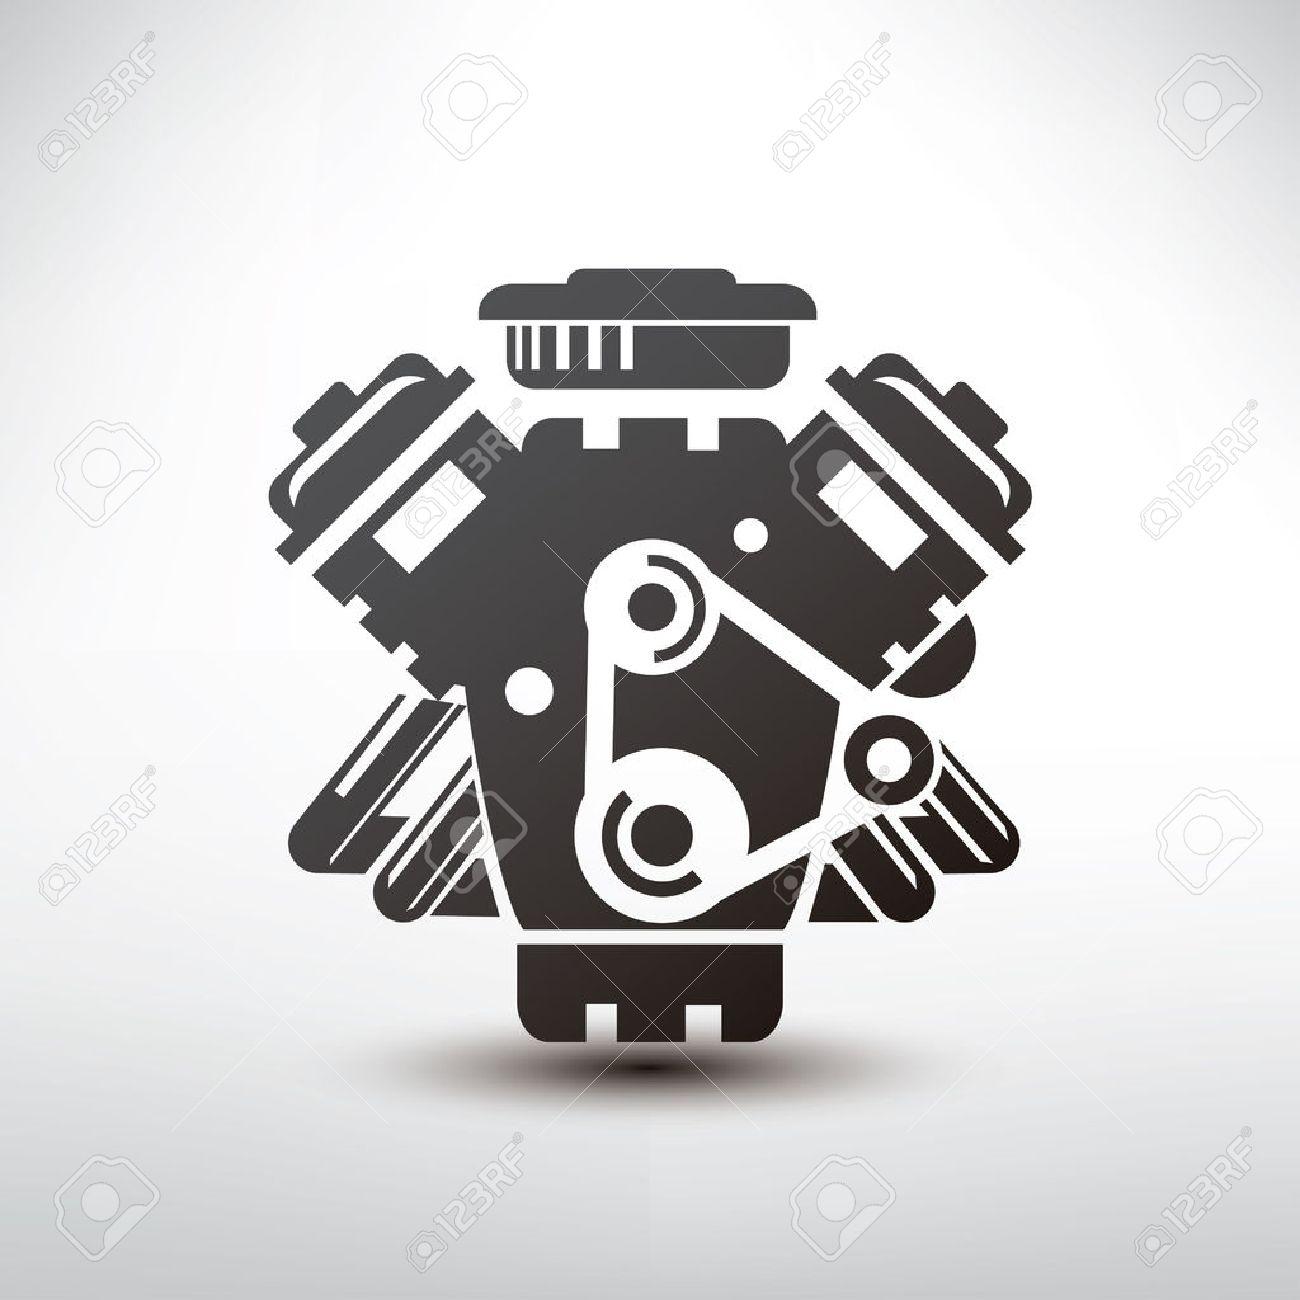 1300x1300 Free Engine Icon Vector 353222 Download Engine Icon Vector